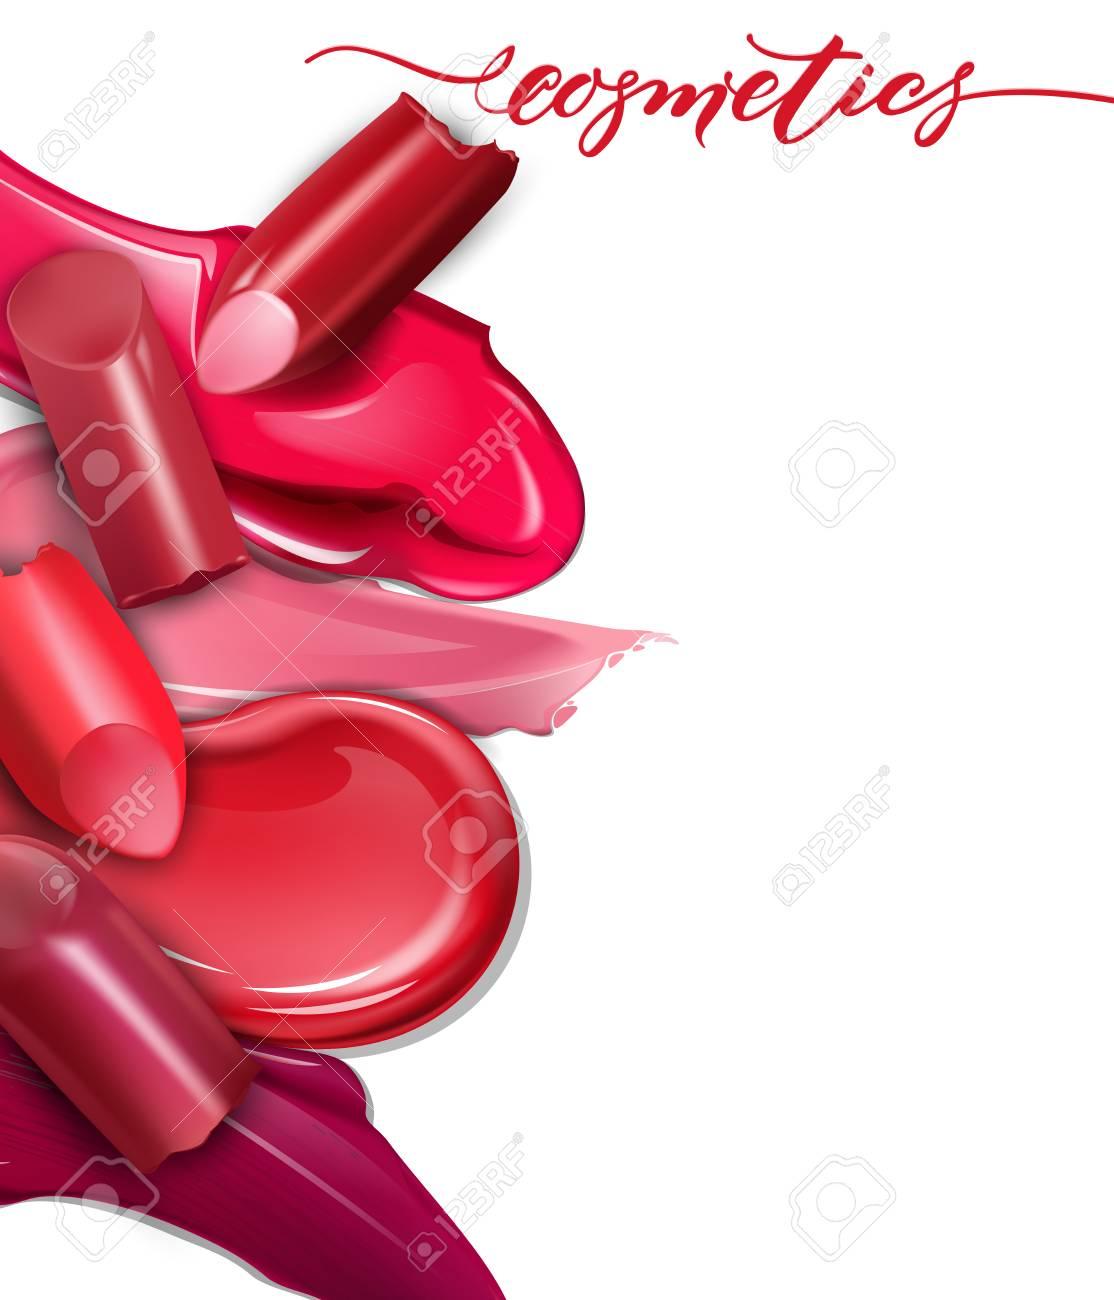 broken lipsticks closeup and